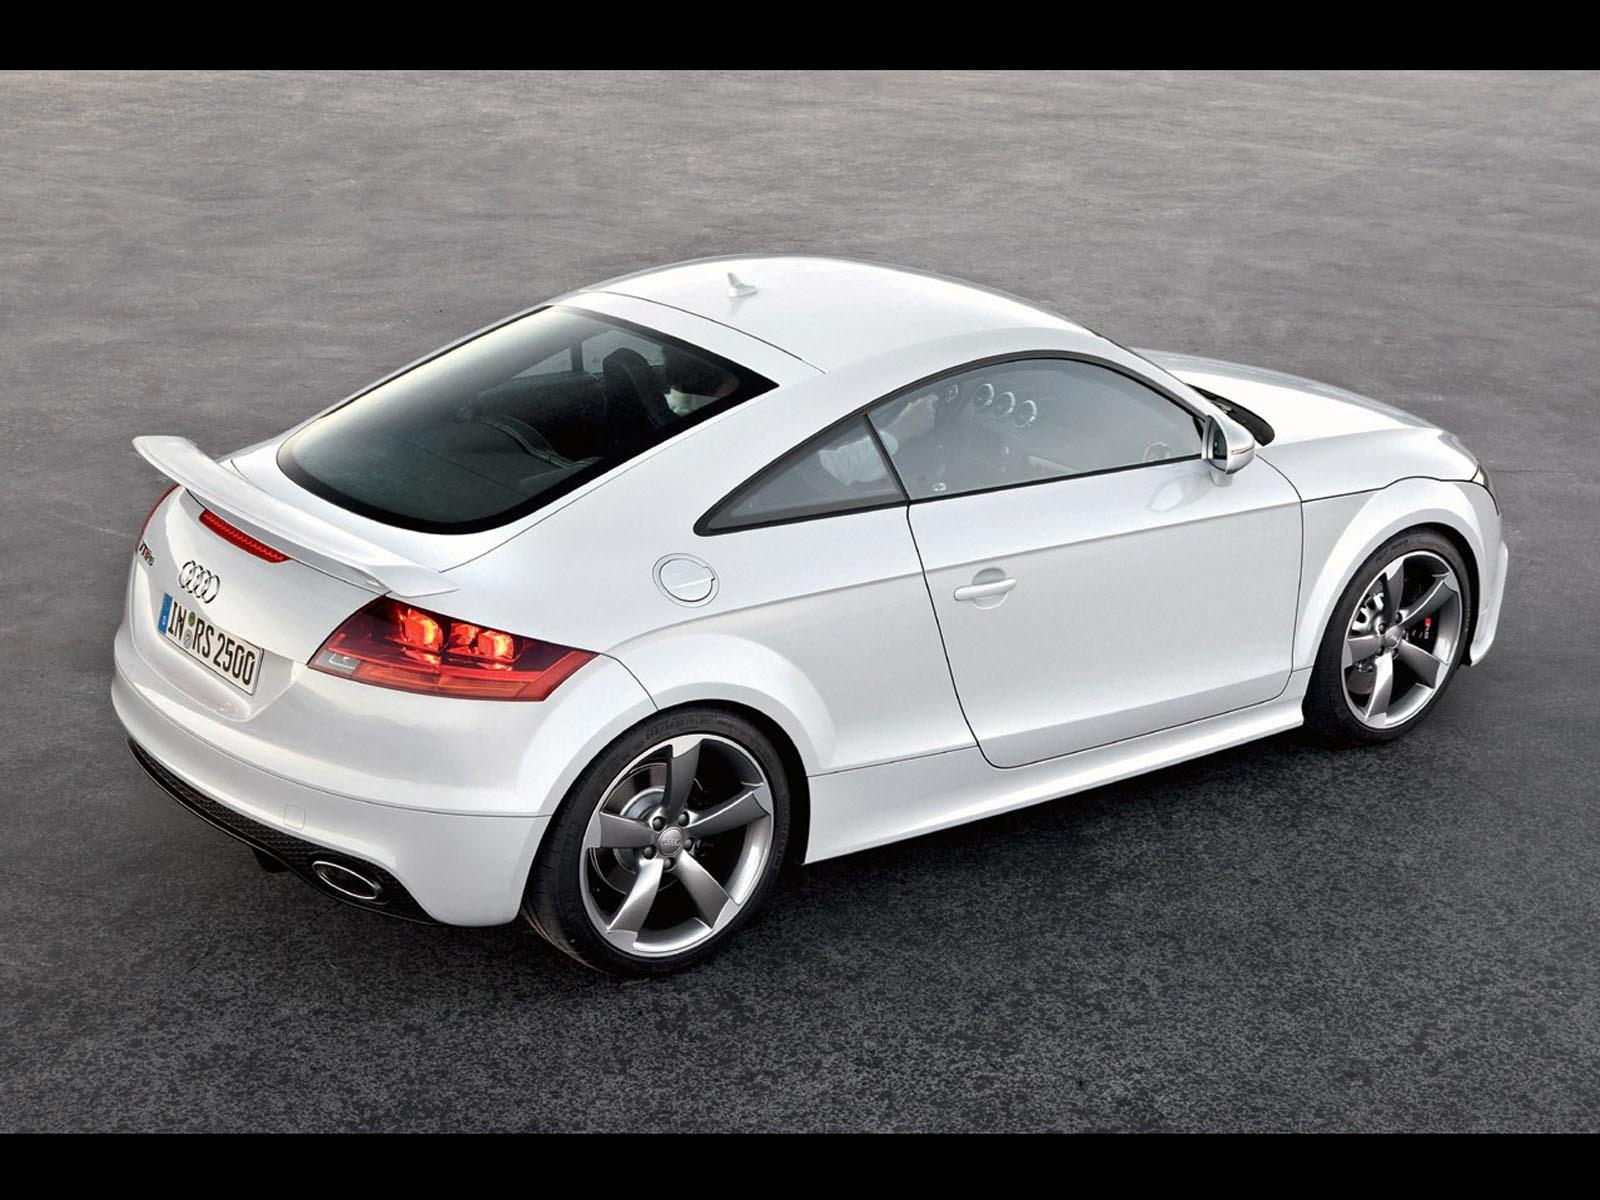 Audi TT RS Wallpapers Audi TT RS DesktopWallpapers Audi TT RS 1600x1200